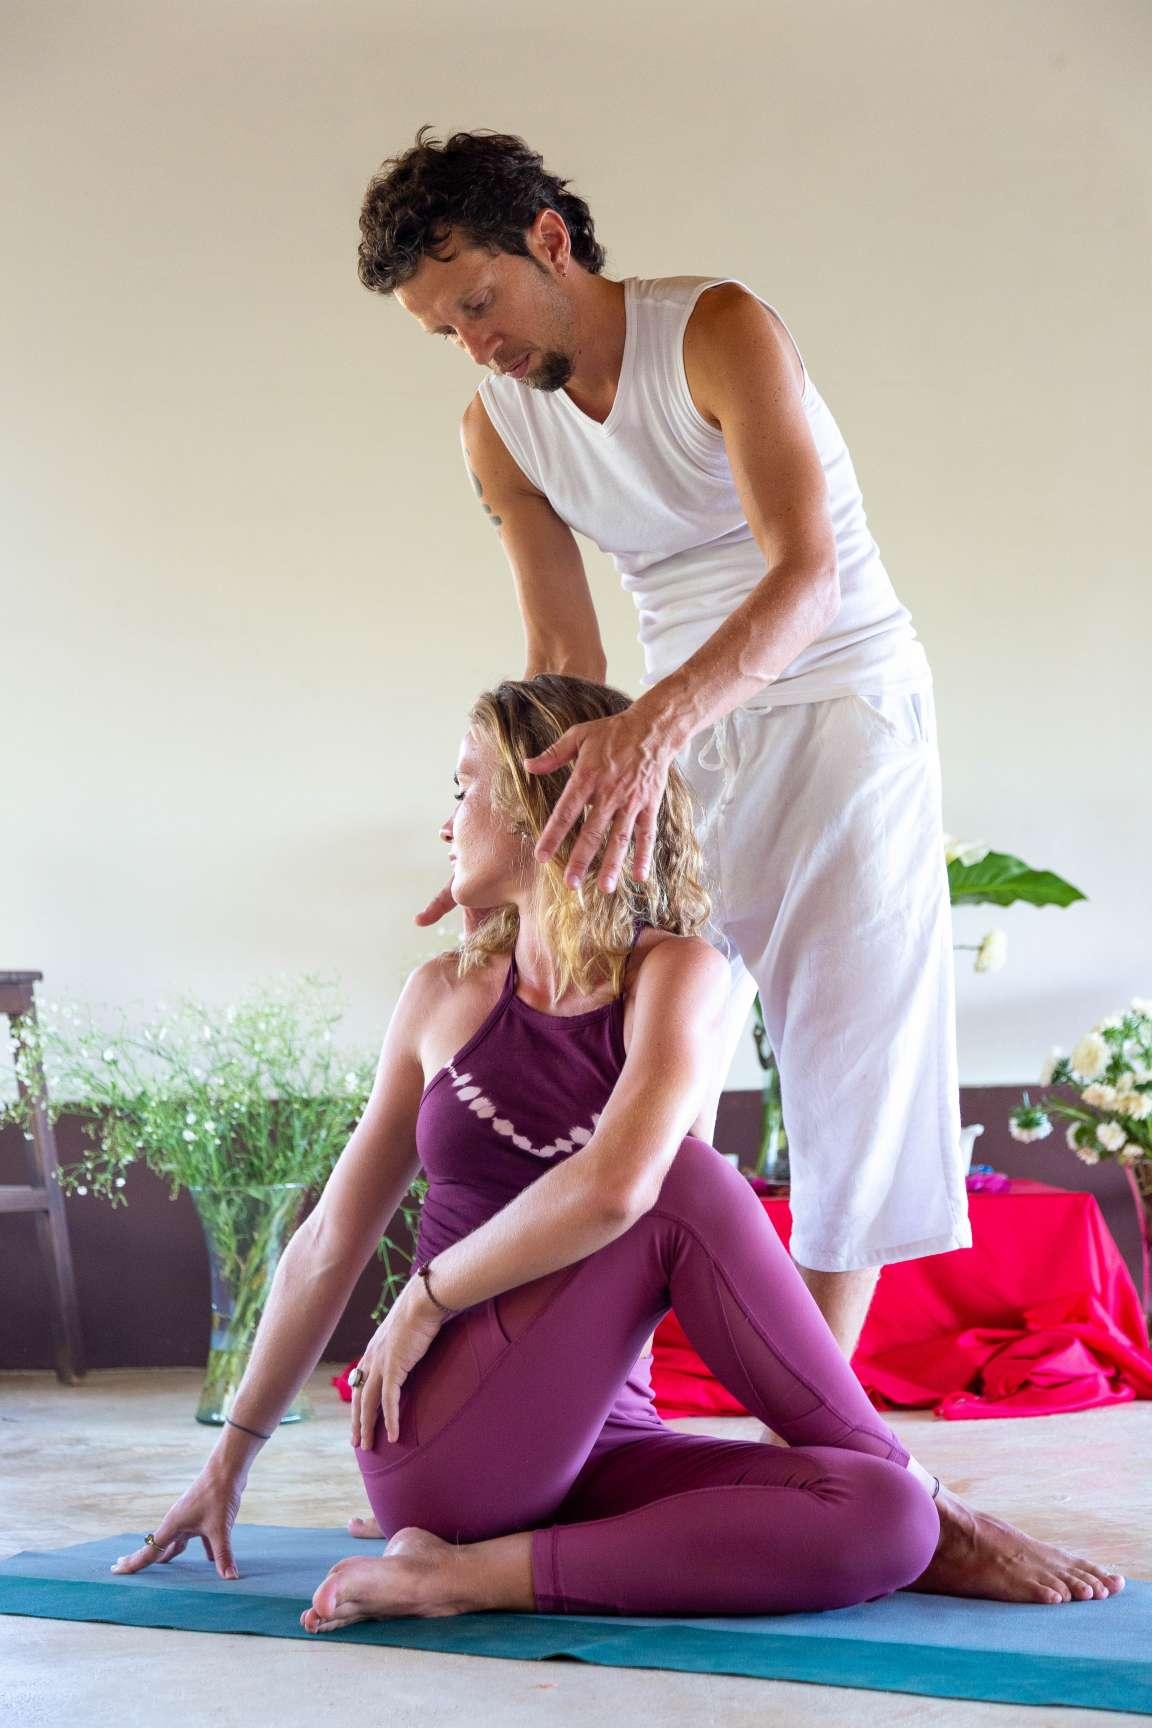 man yoga teacher assisting woman in twist yoga pose